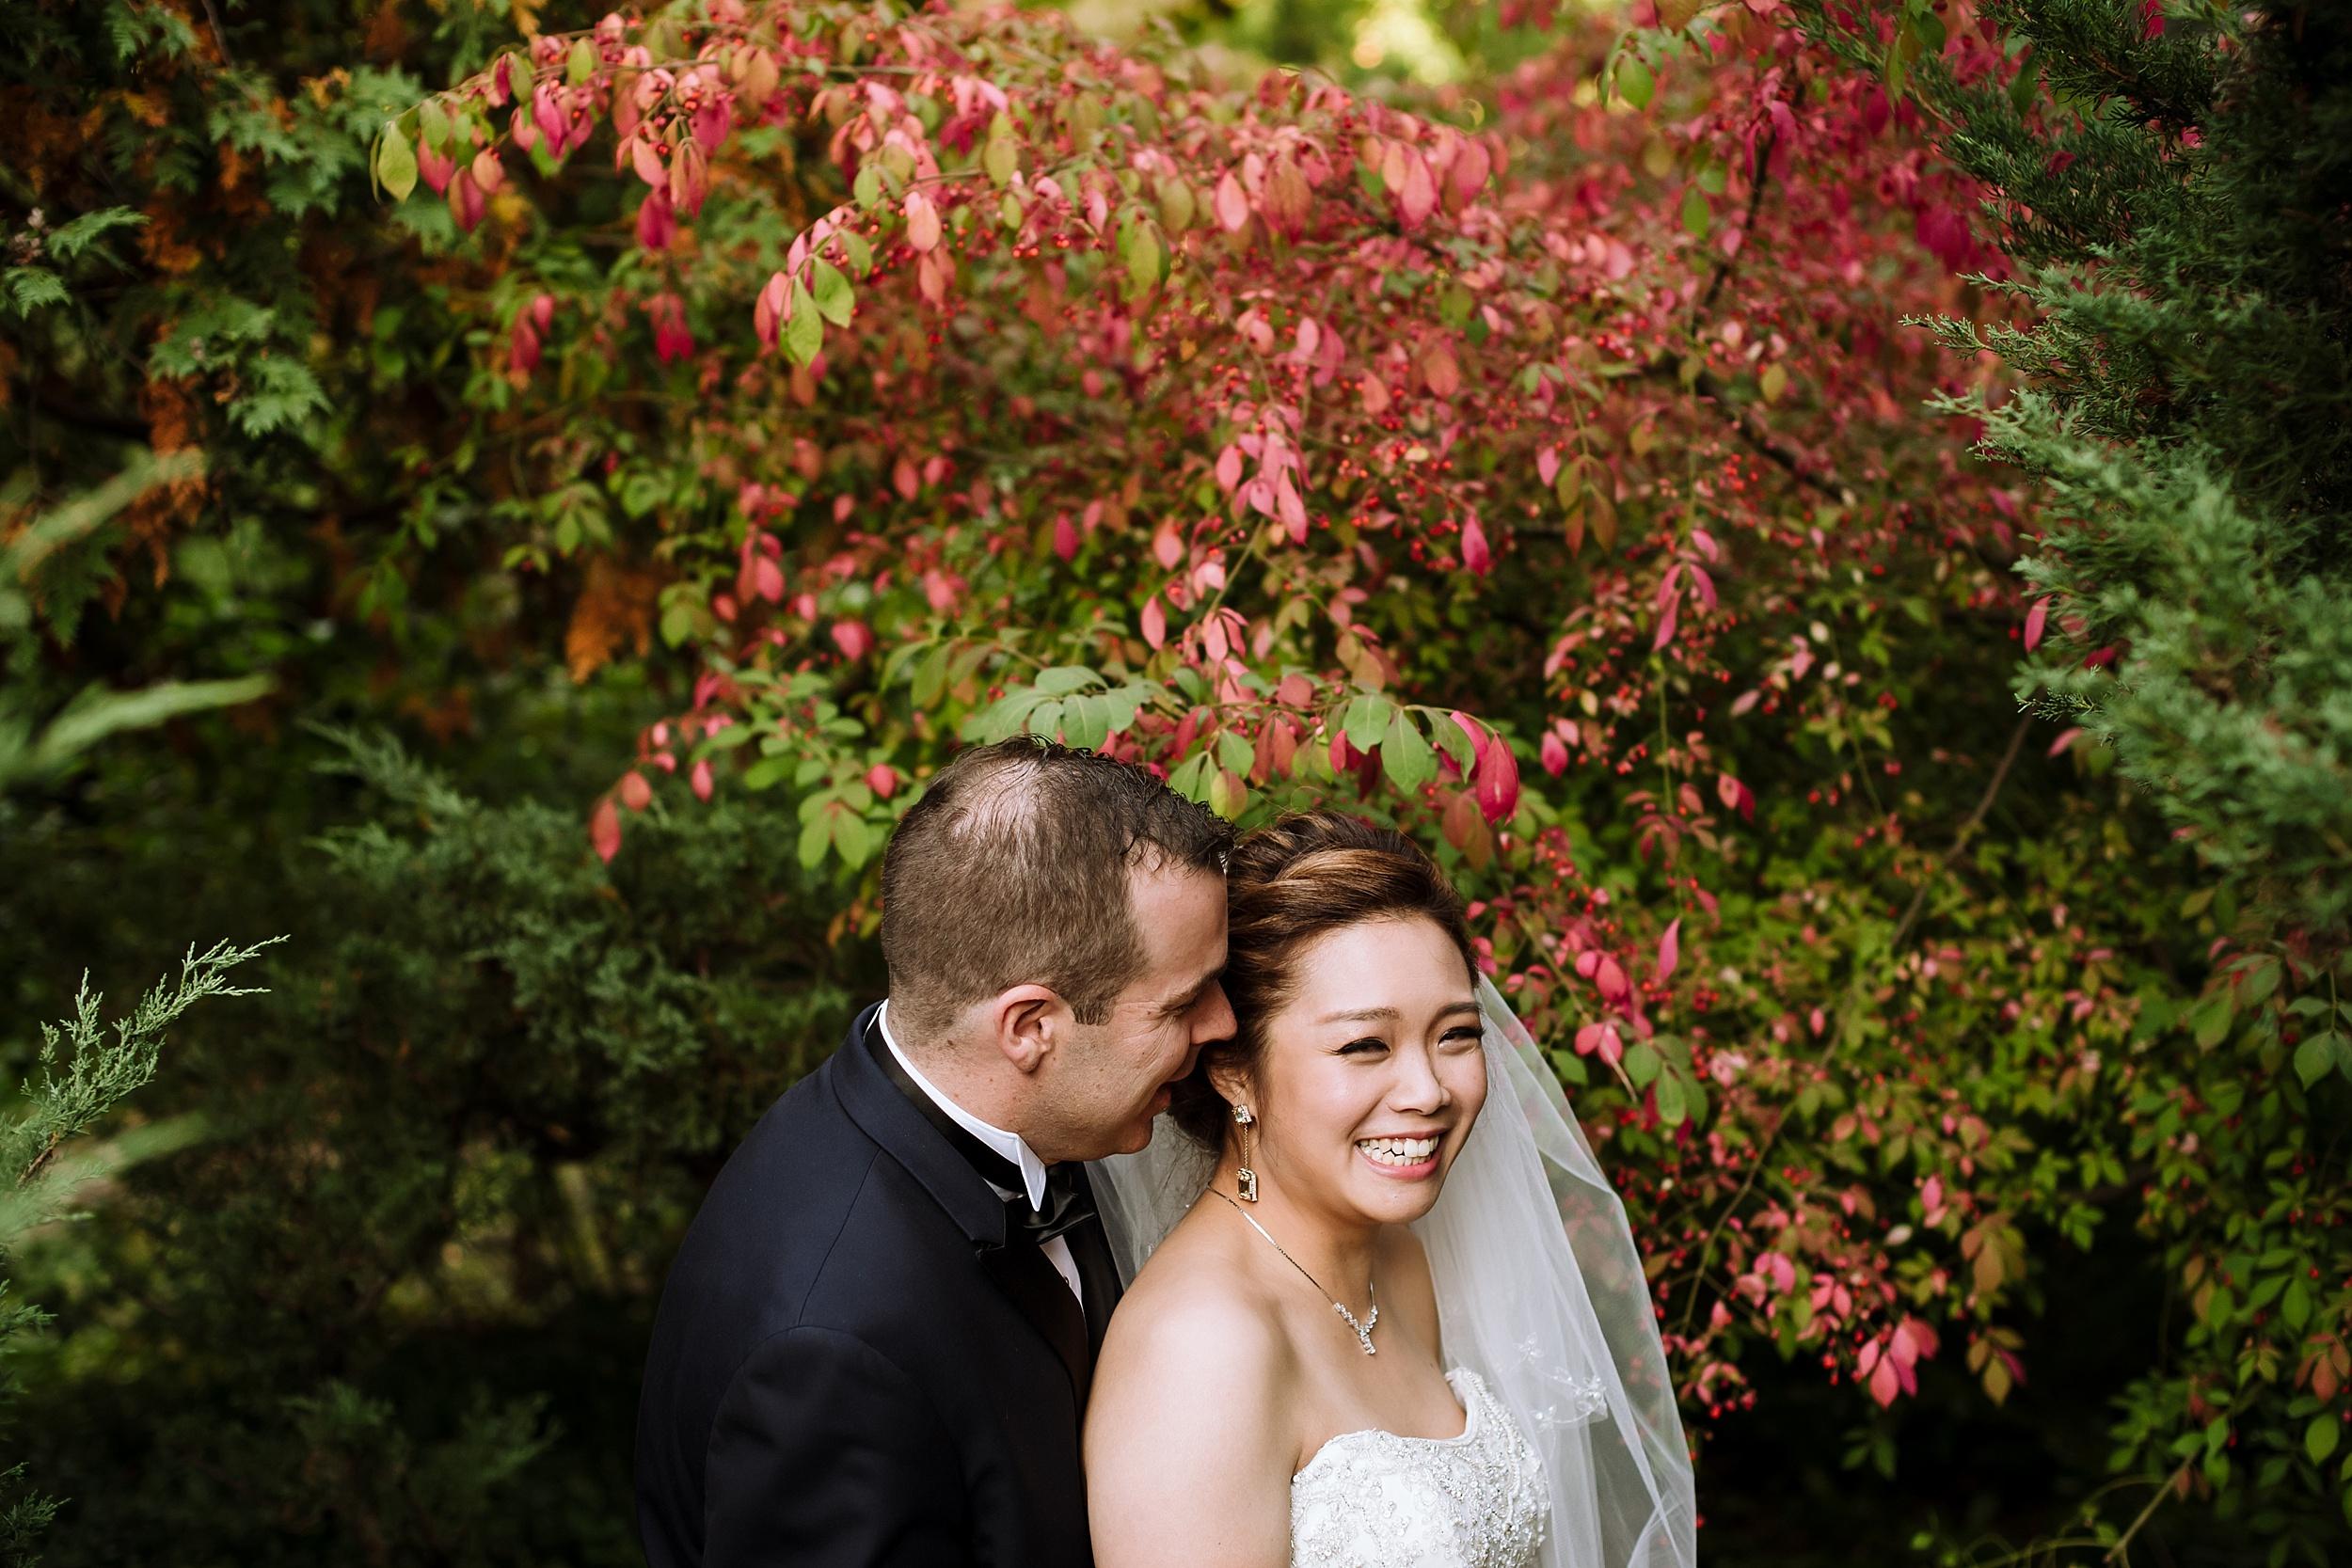 Sunnybrook_Estates_Alexander_Muir_Toronto_Wedding_Photographer_0014.jpg